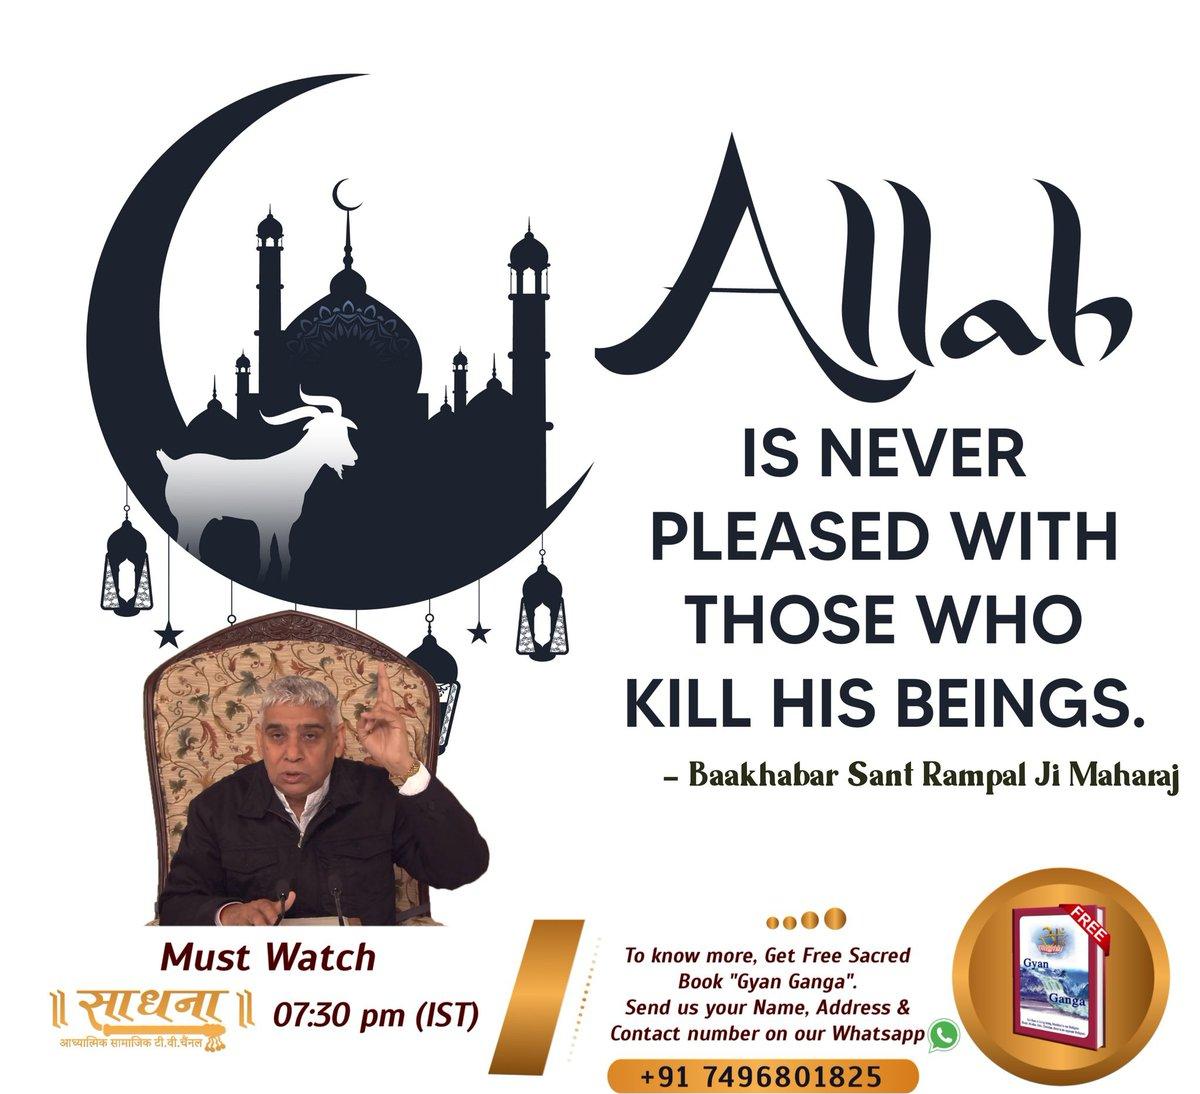 #ThursdayThoughts  #Allah_Prohibits_EatingMeat 𝙄𝙩 𝙞𝙨 𝙤𝙣𝙡𝙮 𝙞𝙜𝙣𝙤𝙧𝙖𝙣𝙩 𝙈𝙪𝙡𝙡𝙖𝙝 𝙆𝙖𝙯𝙞𝙨 𝙬𝙝𝙤 𝙢𝙞𝙨𝙡𝙚𝙙 𝙃𝙤𝙡𝙮 𝙈𝙪𝙨𝙡𝙞𝙢 𝙧𝙚𝙡𝙞𝙜𝙞𝙤𝙣 𝙗𝙮 𝙣𝙤𝙩 𝙨𝙝𝙤𝙬𝙞𝙣𝙜 𝙧𝙚𝙖𝙡 𝙠𝙣𝙤𝙬𝙡𝙚𝙙𝙜𝙚 𝙤𝙛 𝙌𝙪𝙧𝙖𝙣 & 𝙆𝙚𝙚𝙥 𝙖𝙬𝙖𝙮 𝙛𝙧𝙤𝙢 𝙩𝙧𝙪𝙩𝙝.